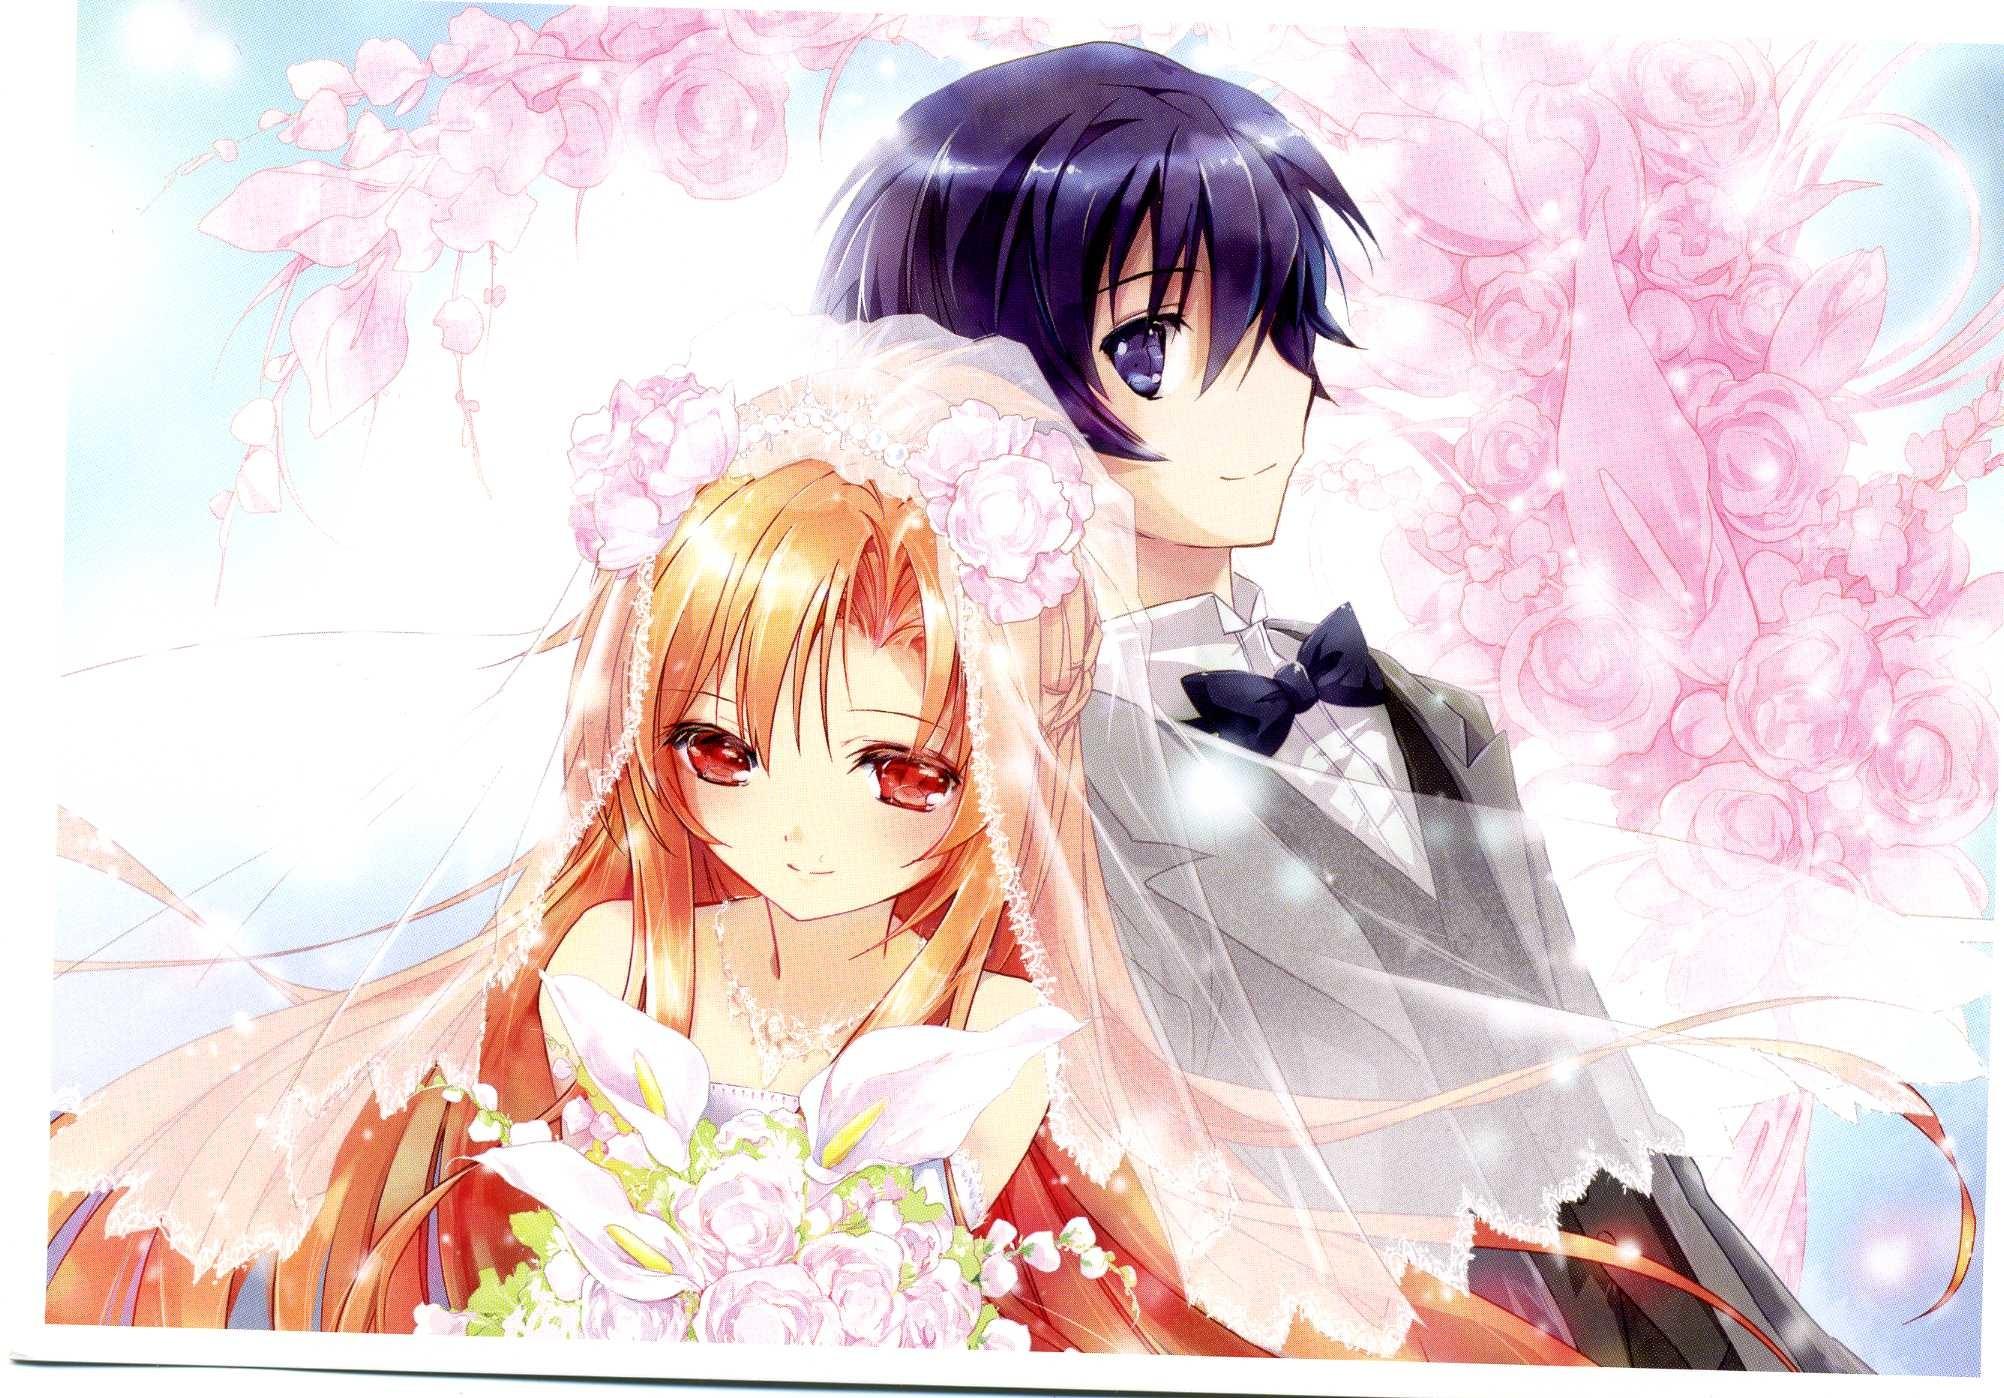 3840x2160 3d love couple wallpaper